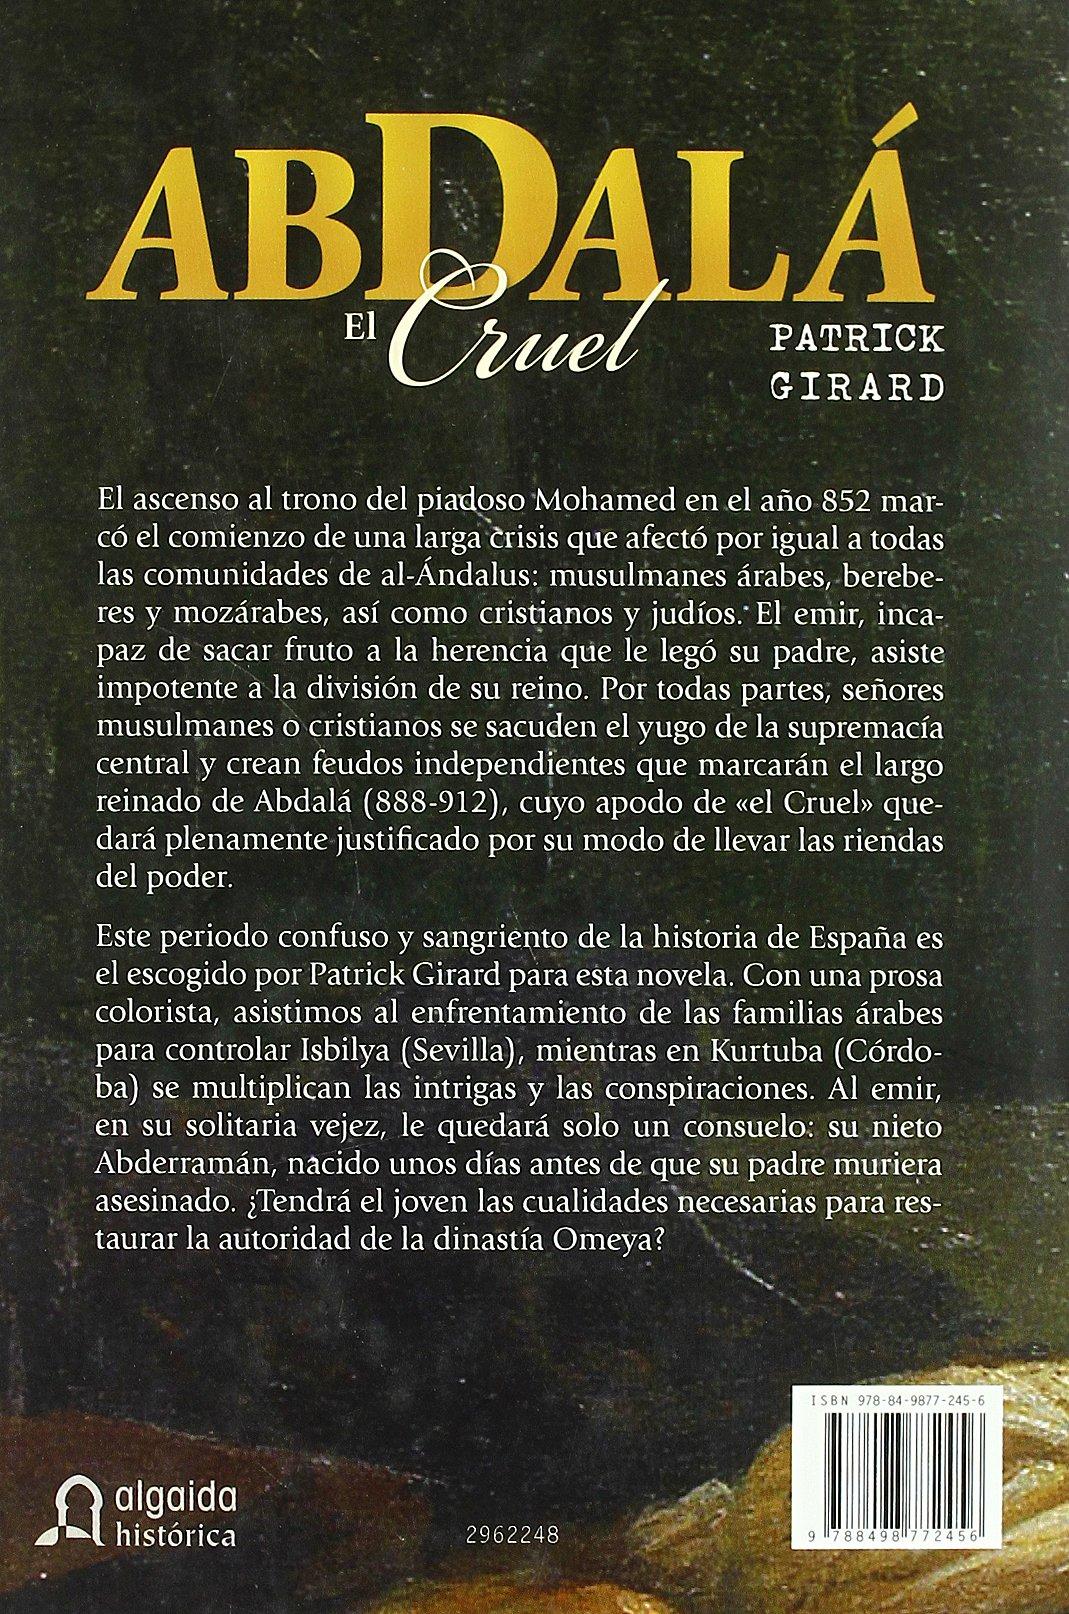 Abdala el Cruel Algaida Literaria - Algaida Histórica: Amazon.es: Girard, Patrick, Bernardo Gil, Elena: Libros